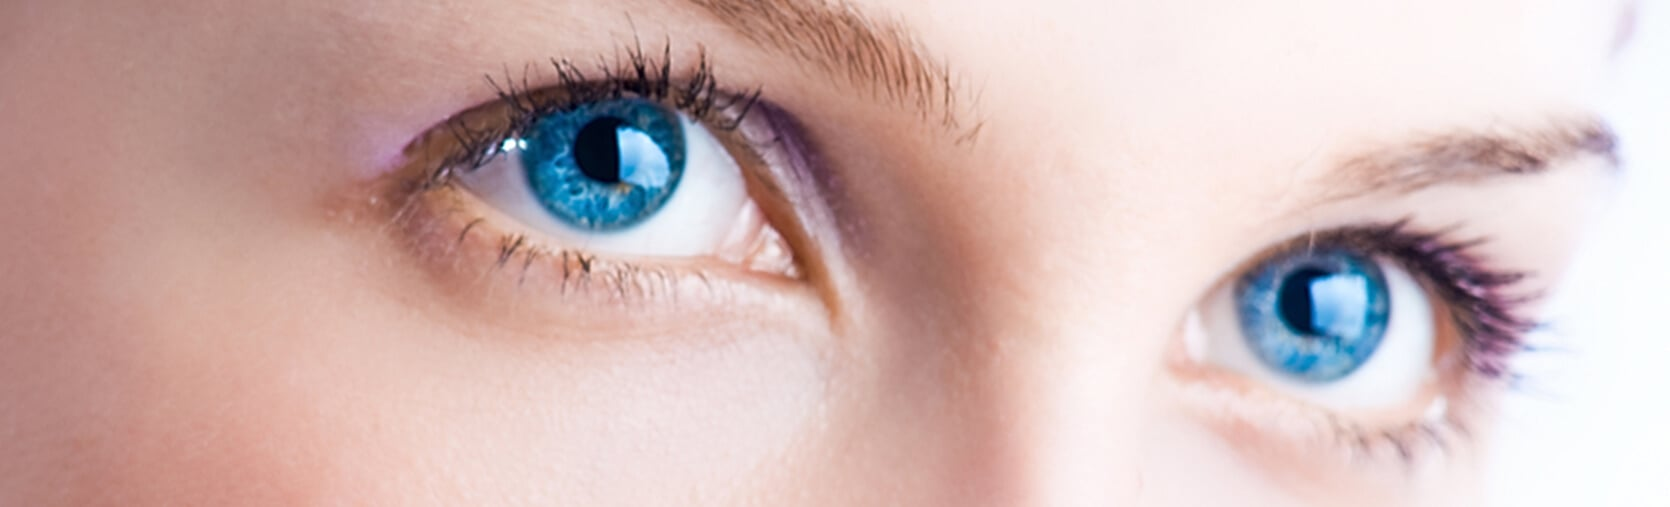 Blue Contact Lenses